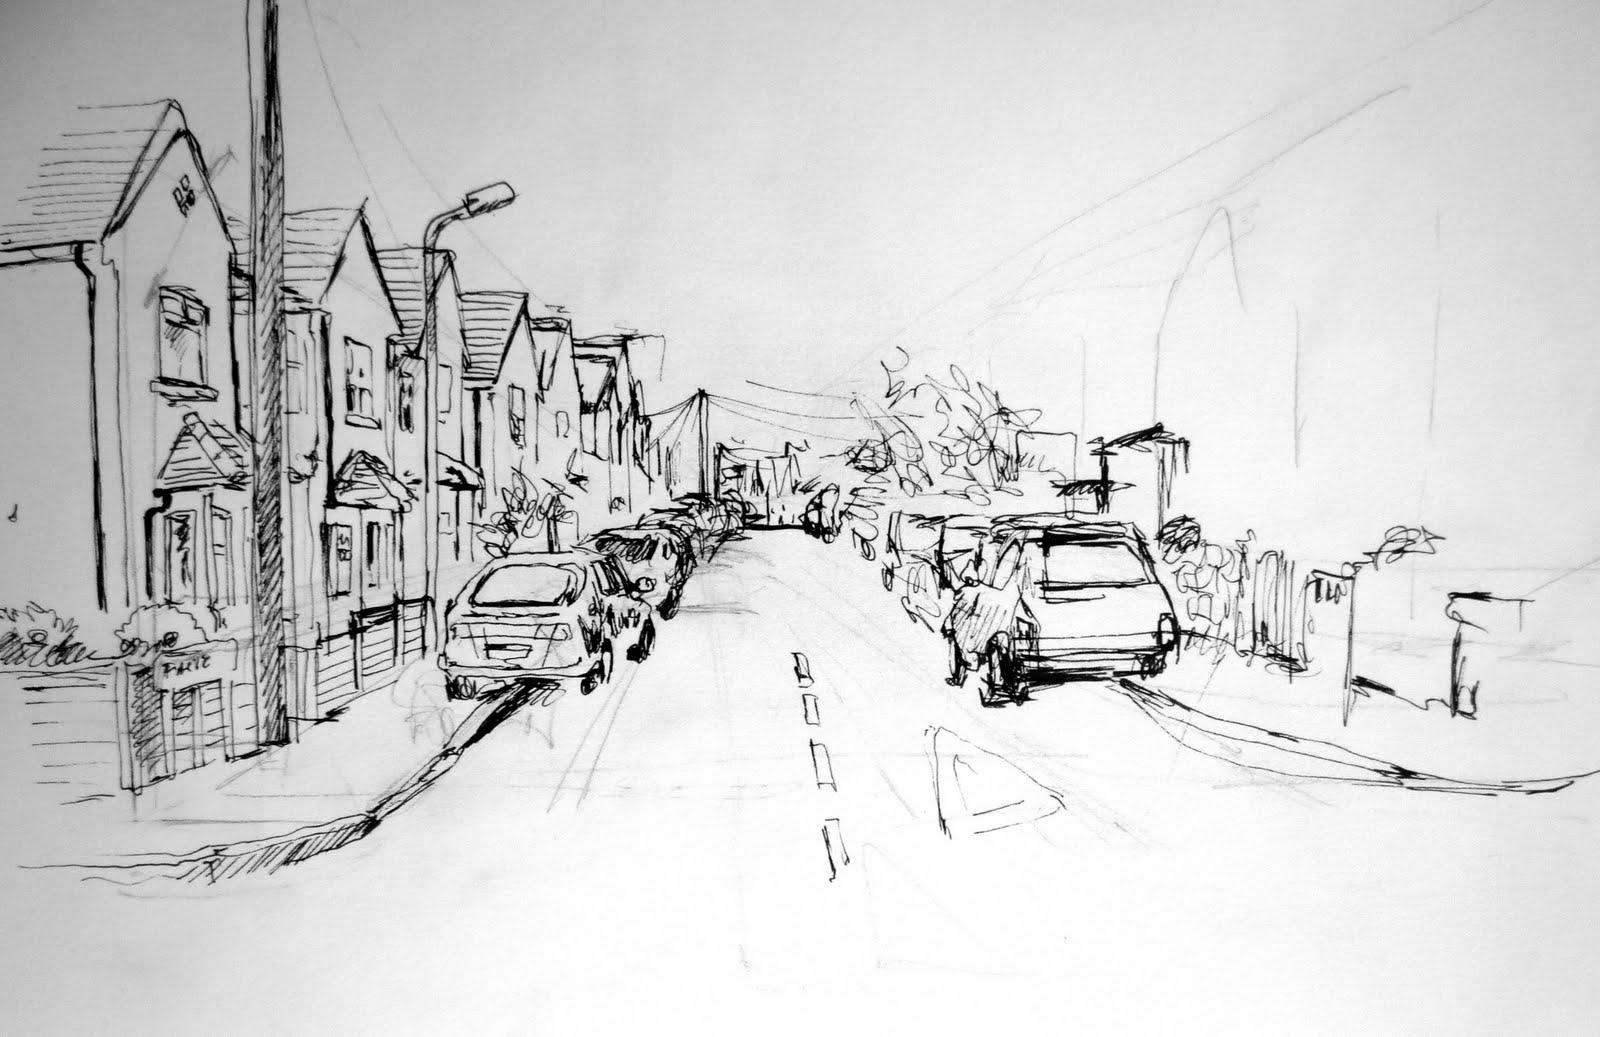 Exploring Illustration: Street: Perspective problems